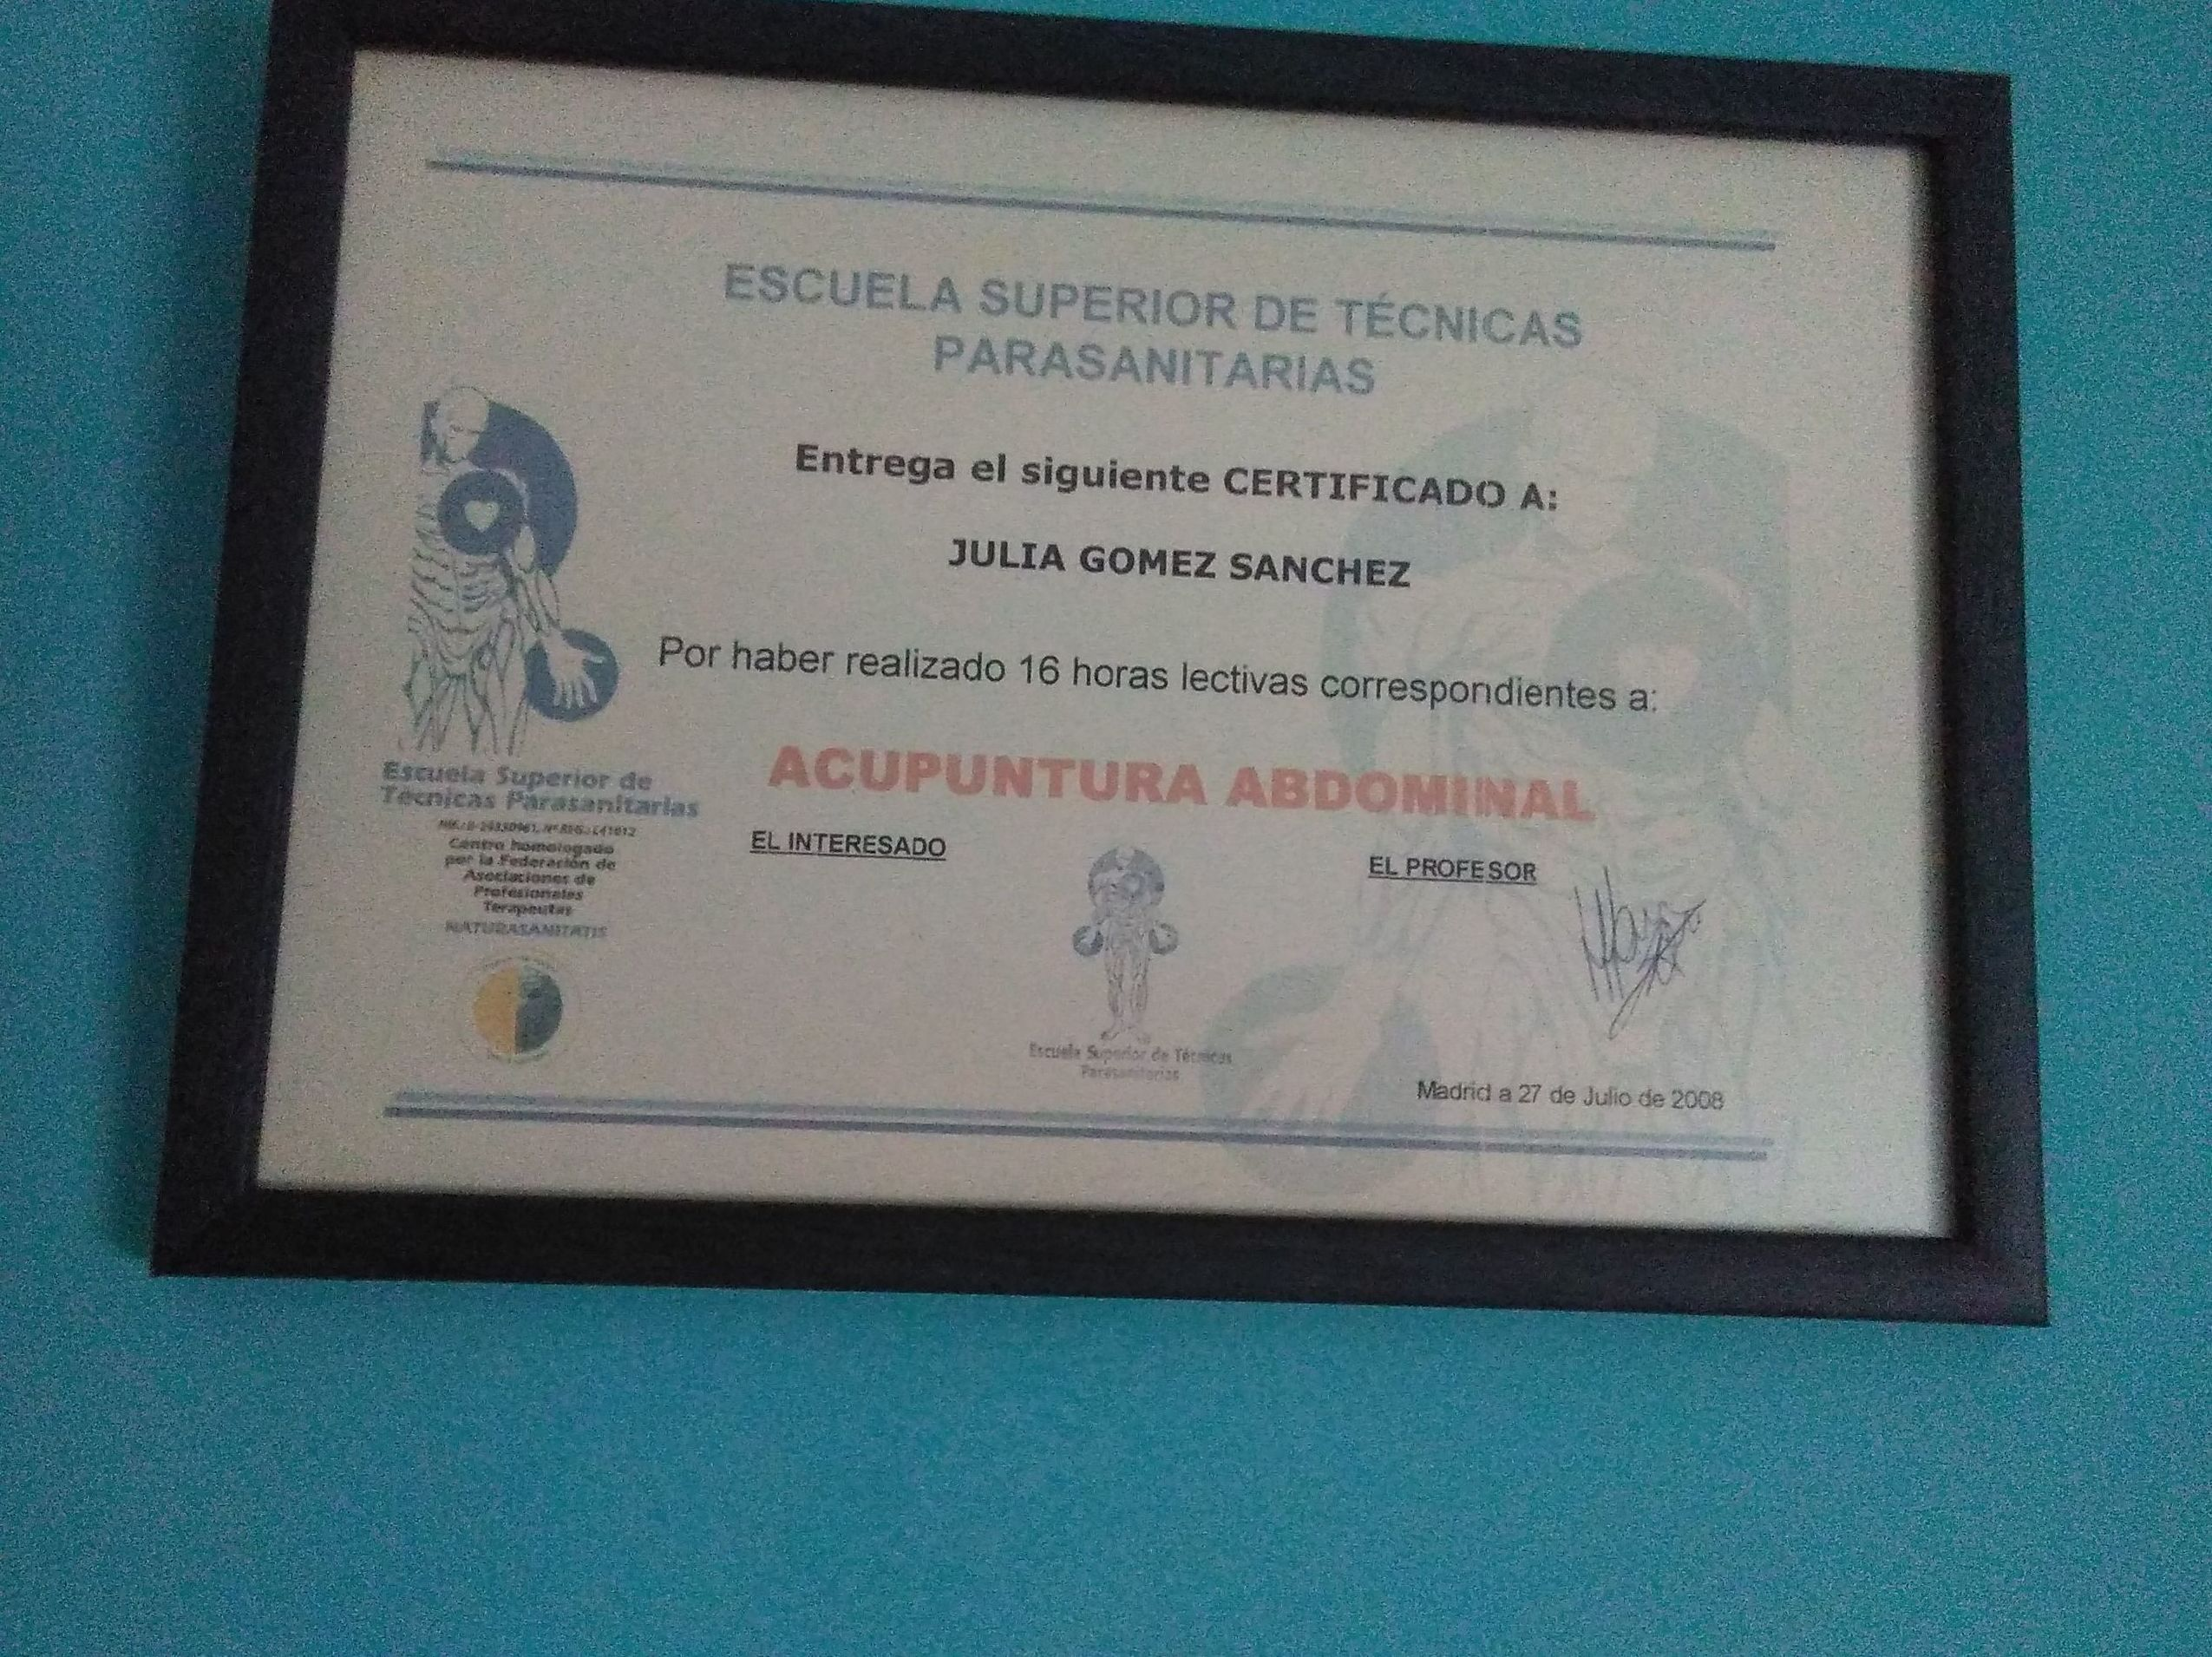 DIPLOMA DE ACUPUNTURA ABDOMINAL